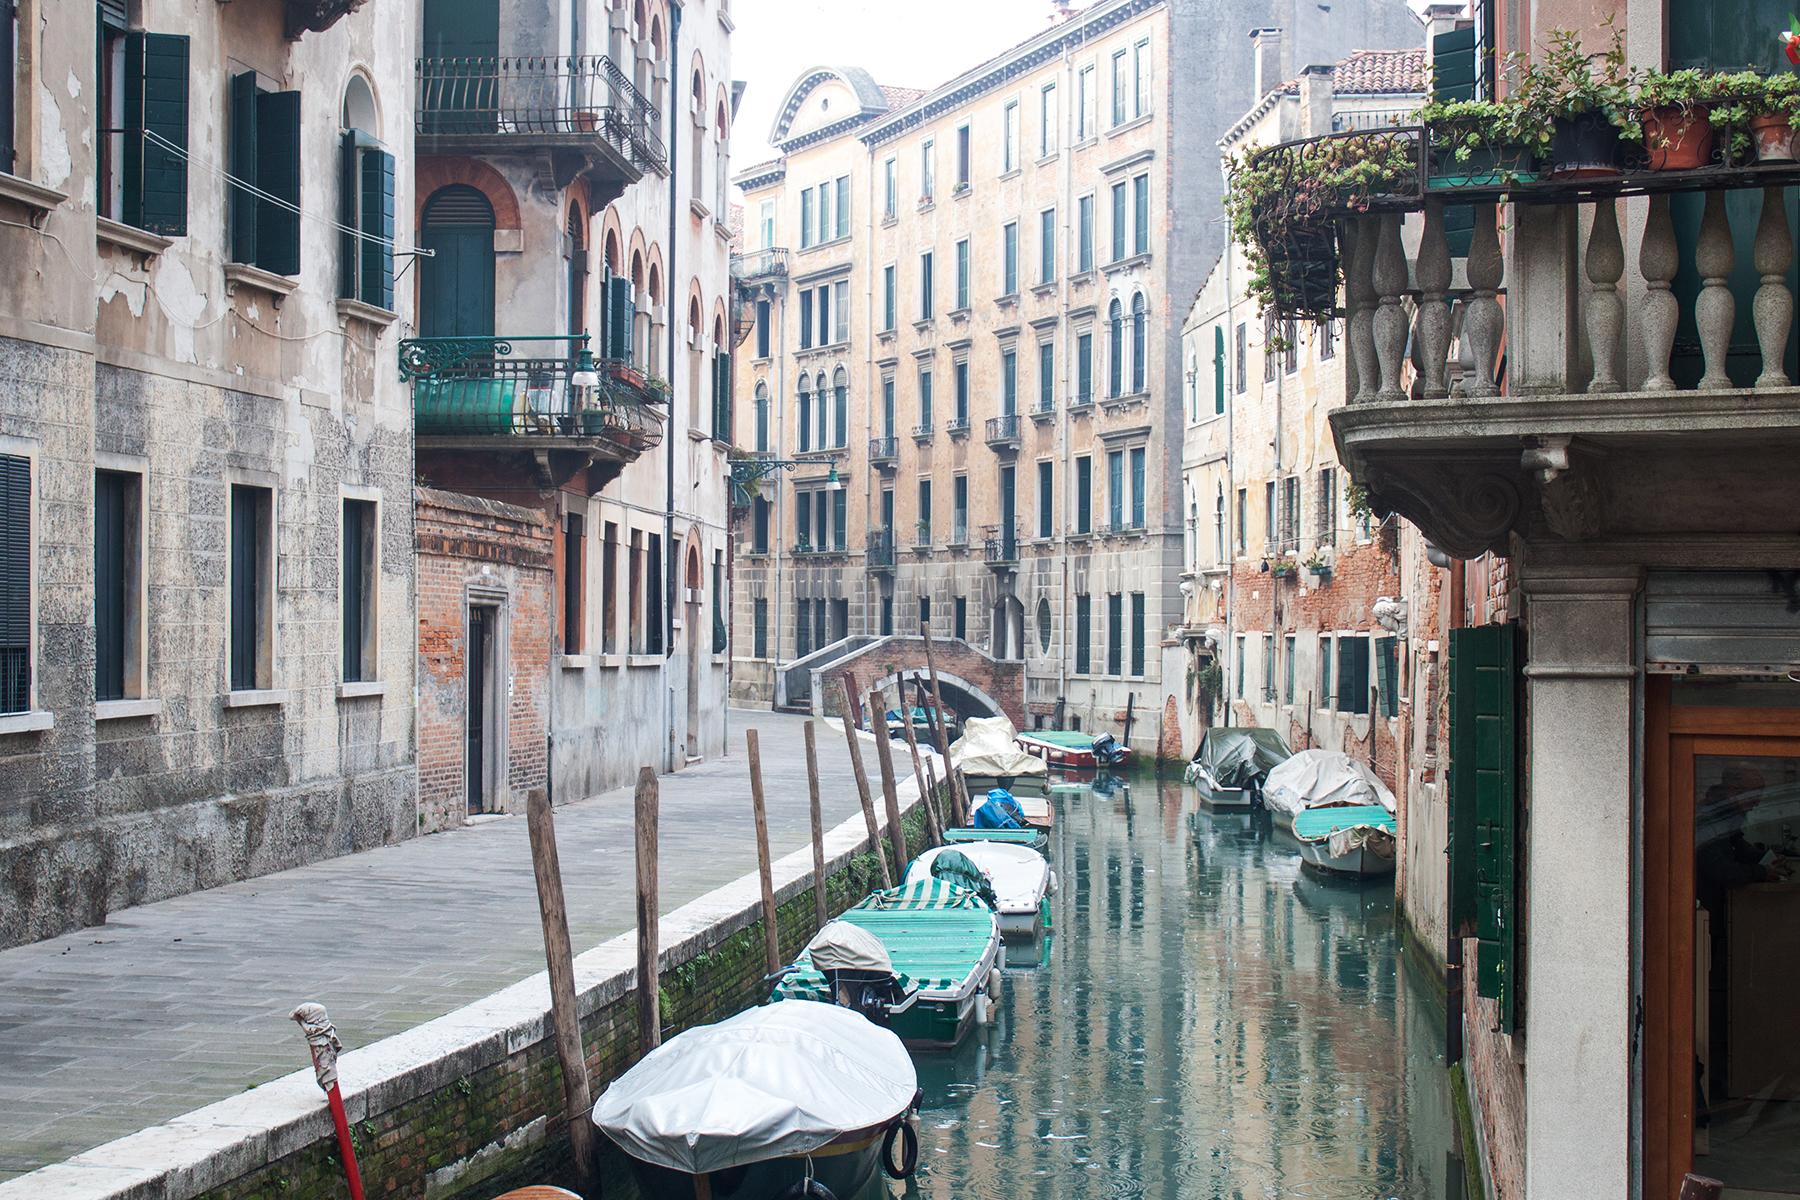 Streets of Venice, Quiet Street | lifeofkitty.co.uk